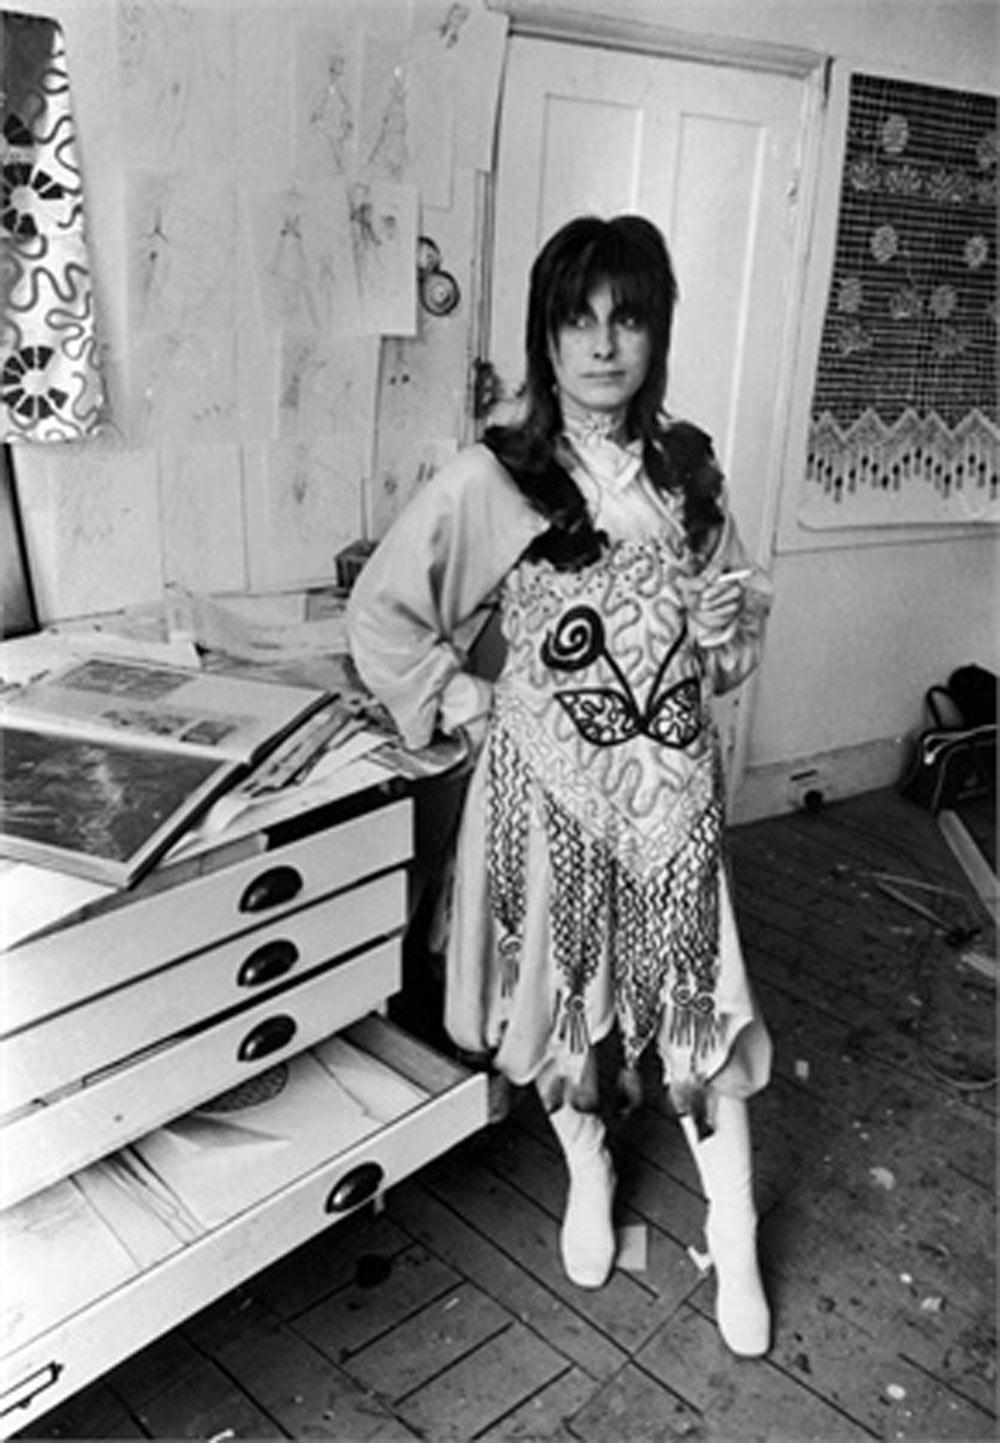 Zandra in 1970 (with green hair) in her London Studio